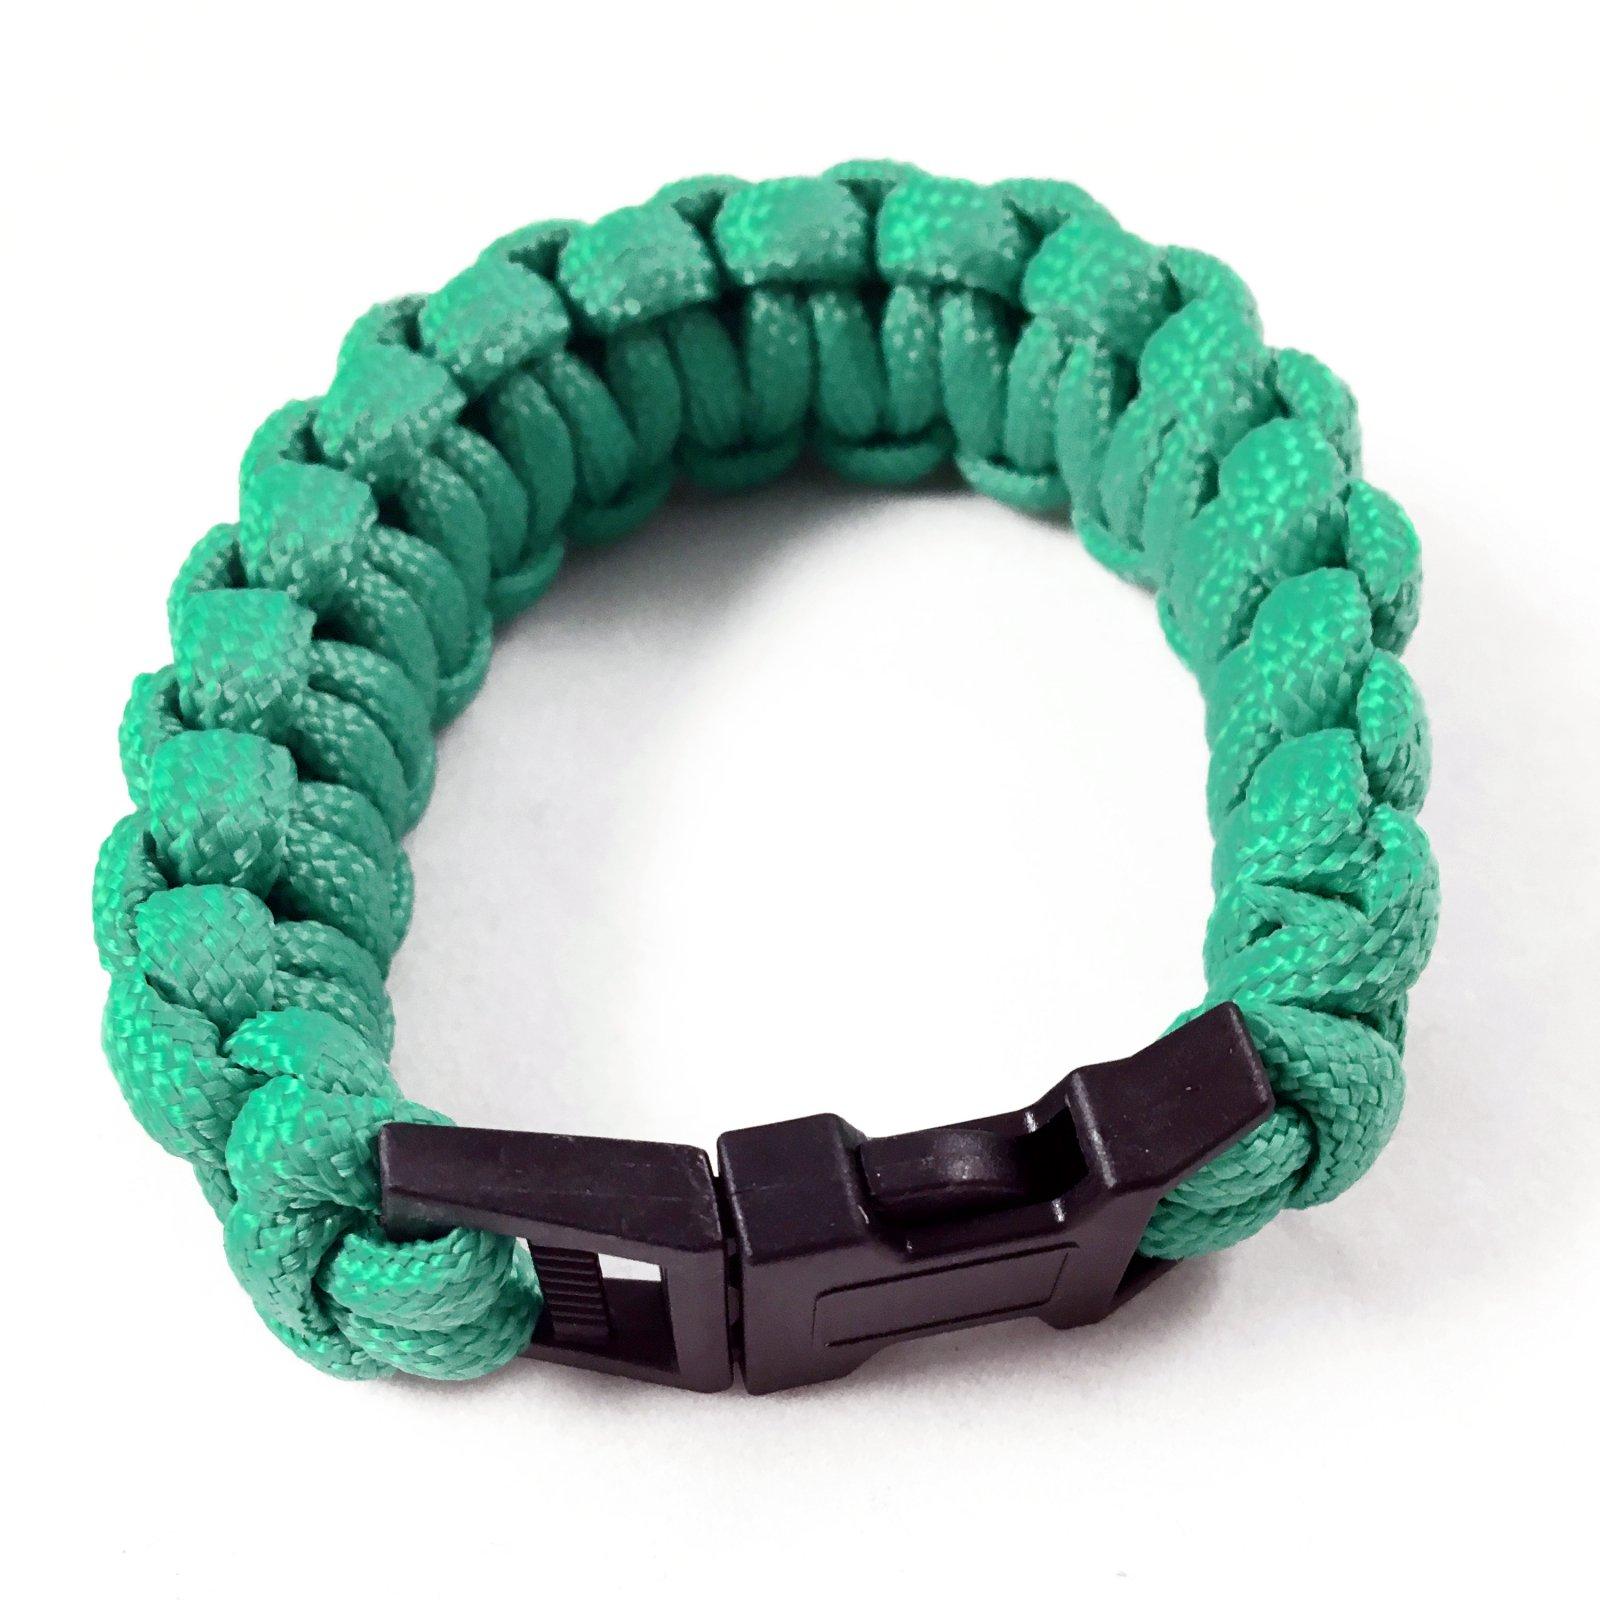 ASR Outdoor - Paracord Bracelet - Green